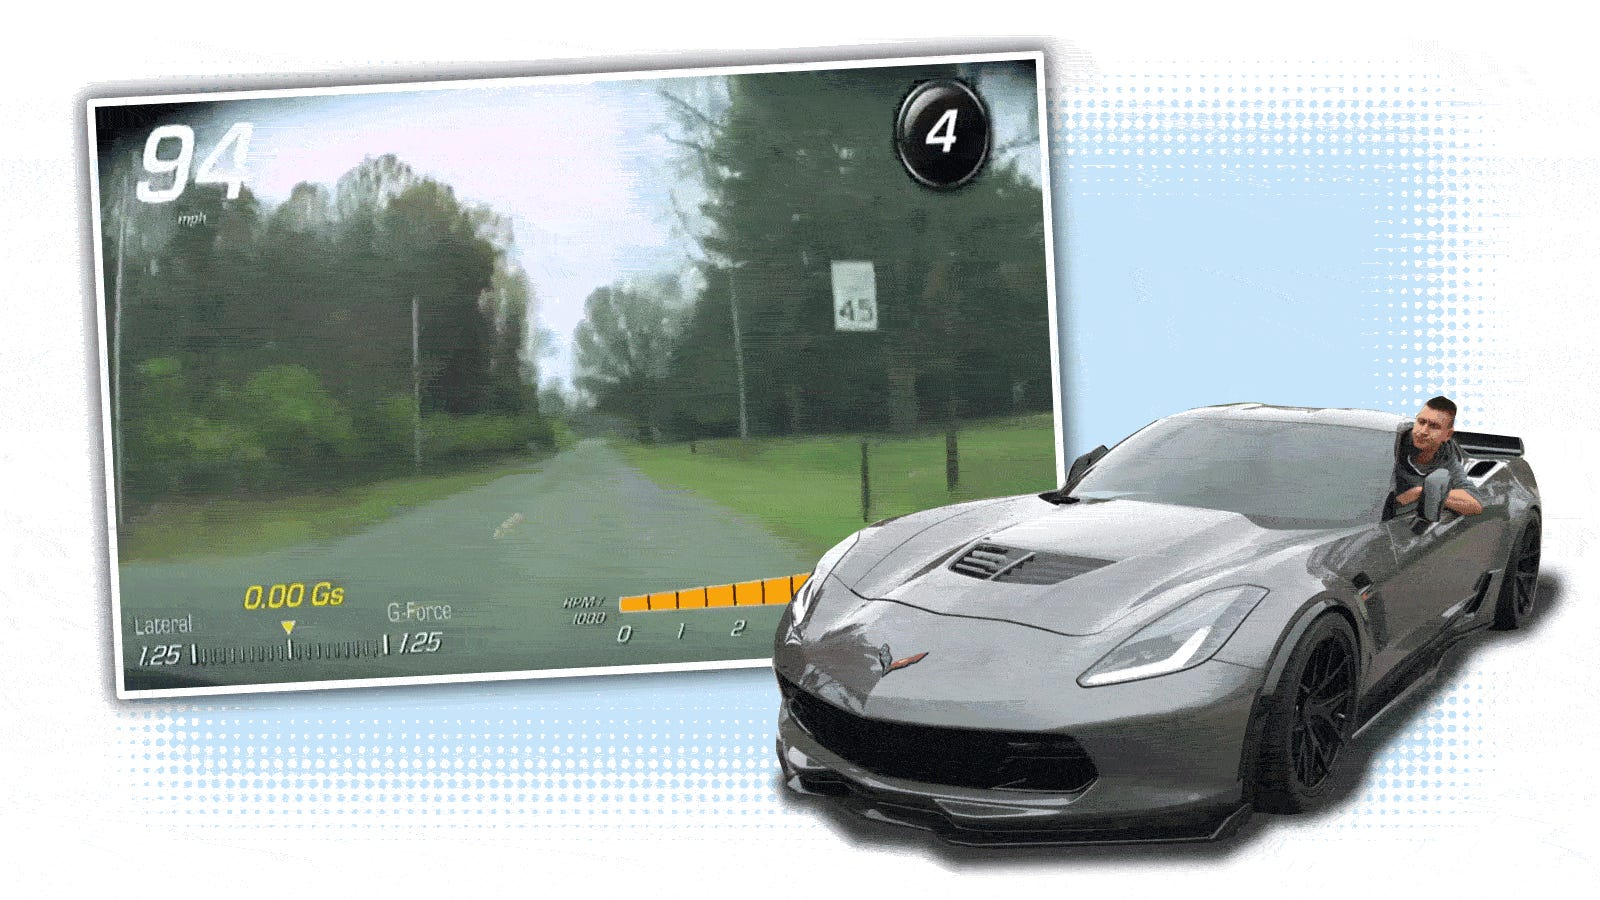 Dealership Caught Taking Customer's Corvette on 90+ MPH Joyride